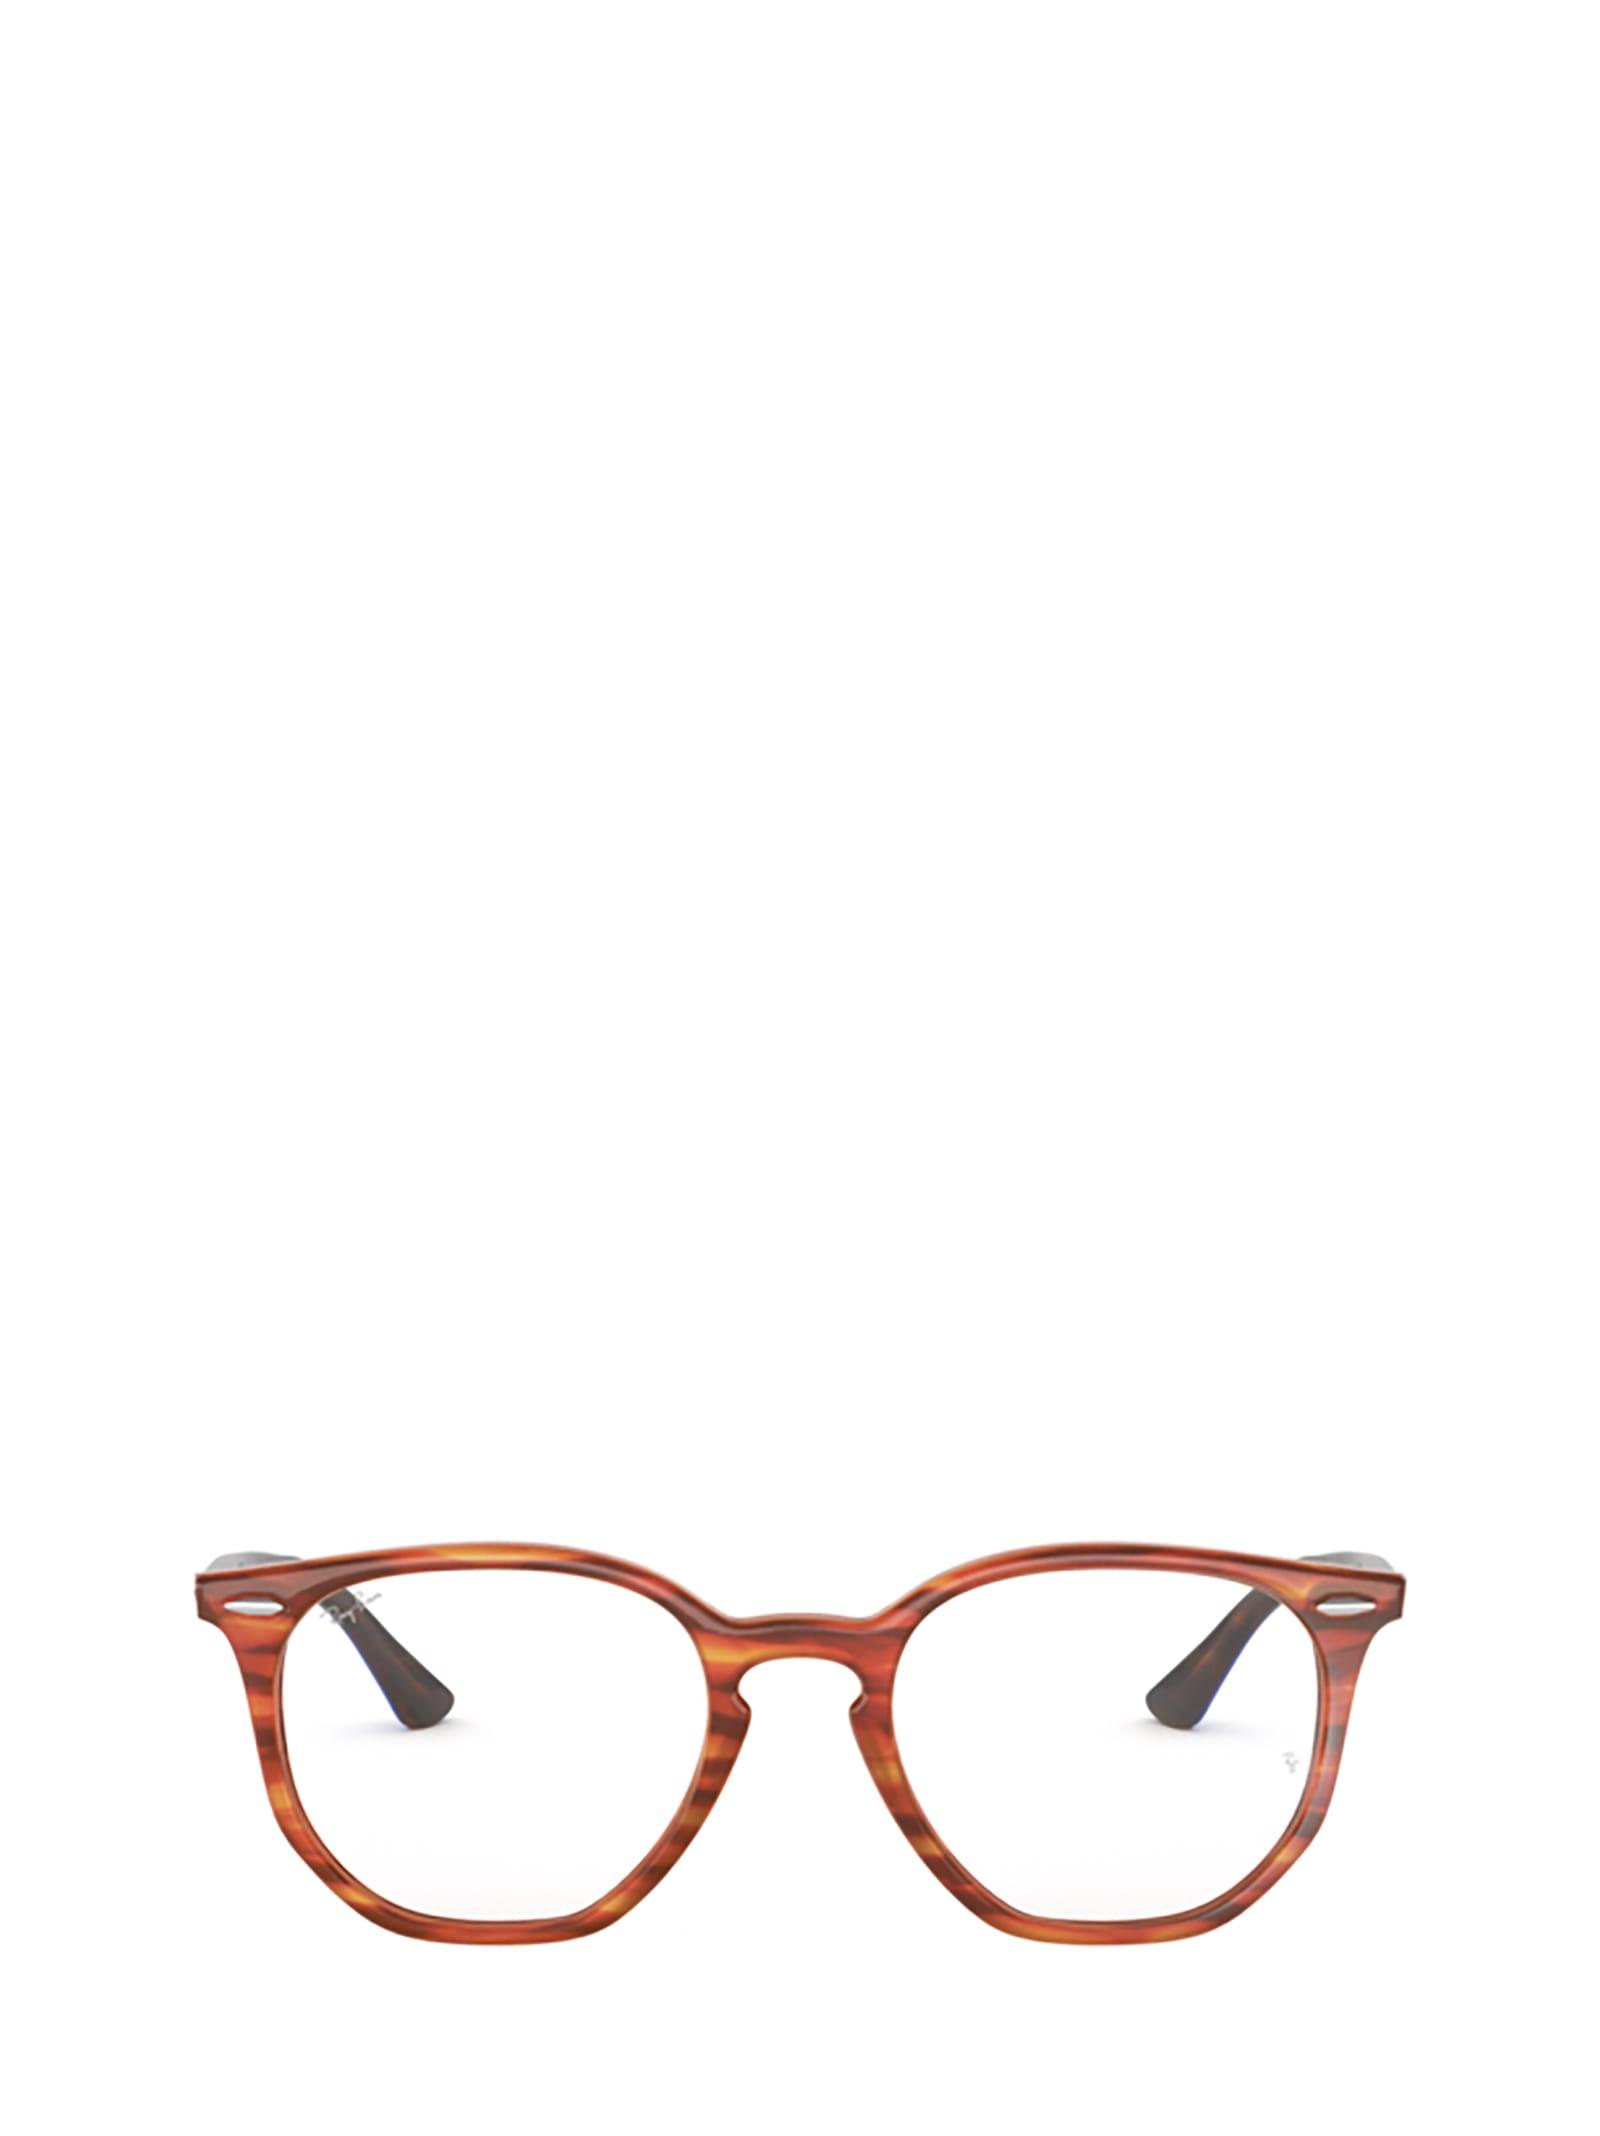 Ray-Ban Ray-ban Rx7151 Light Brown Havana Glasses